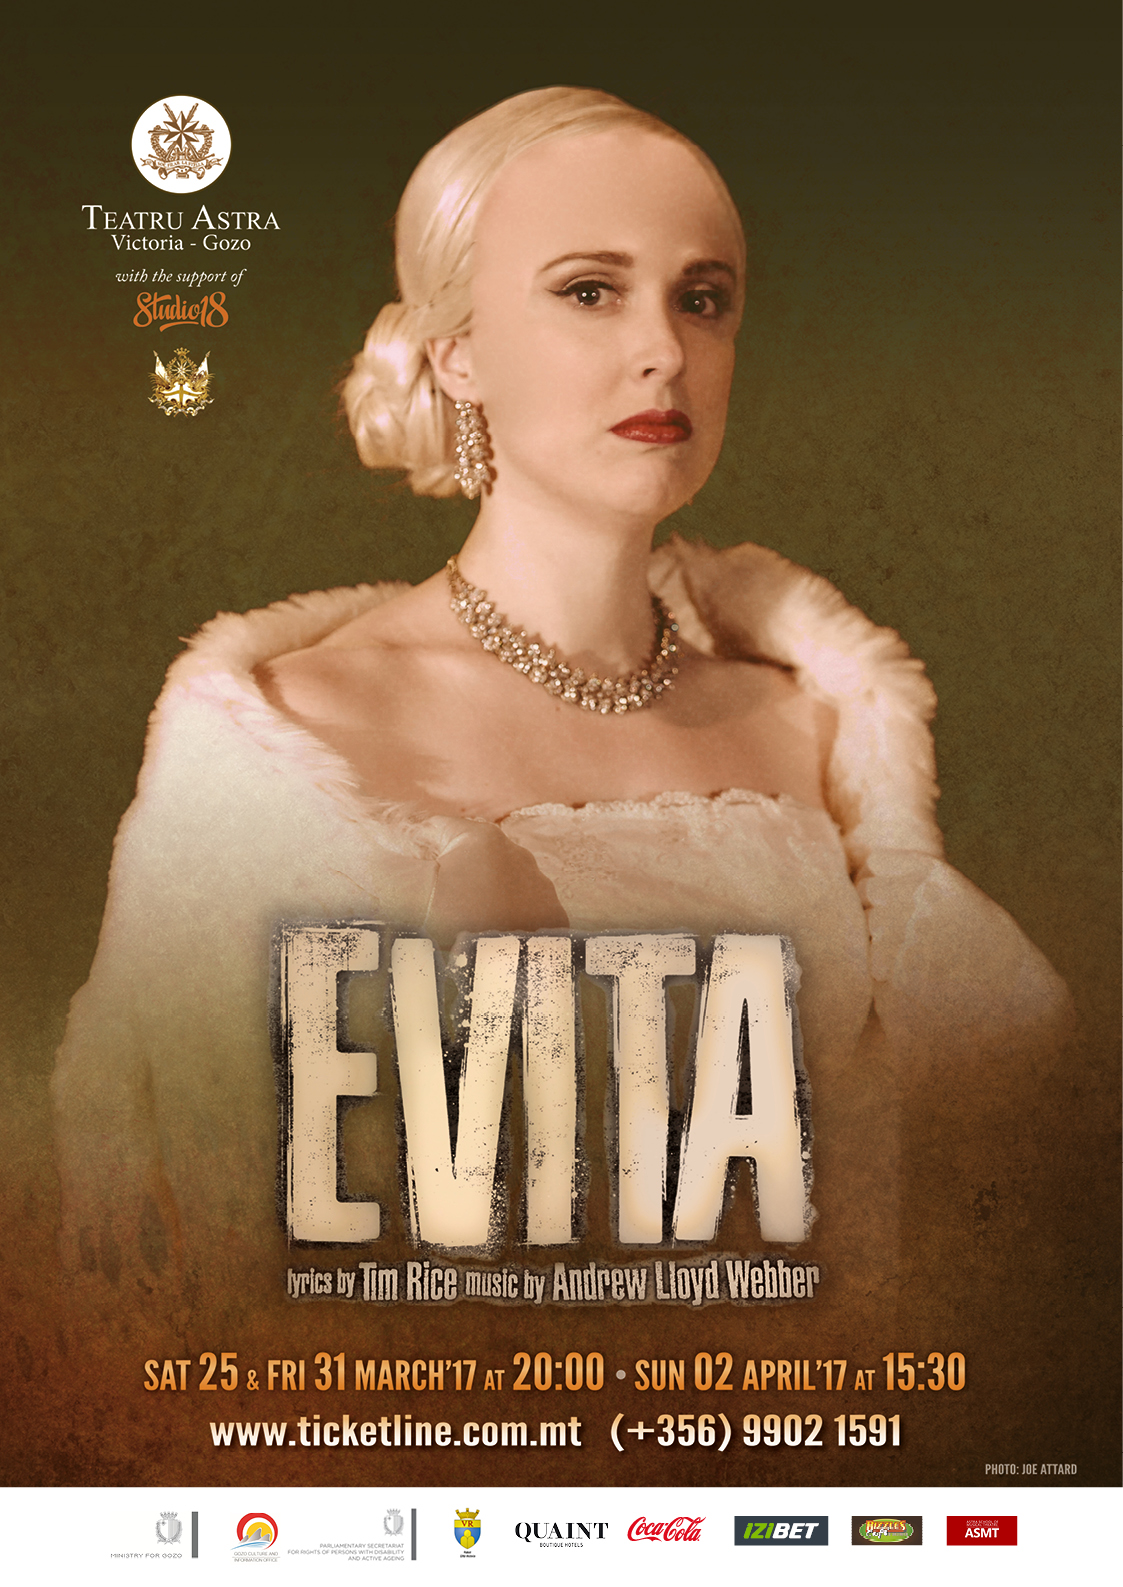 A3 Poster Evita - Cathy